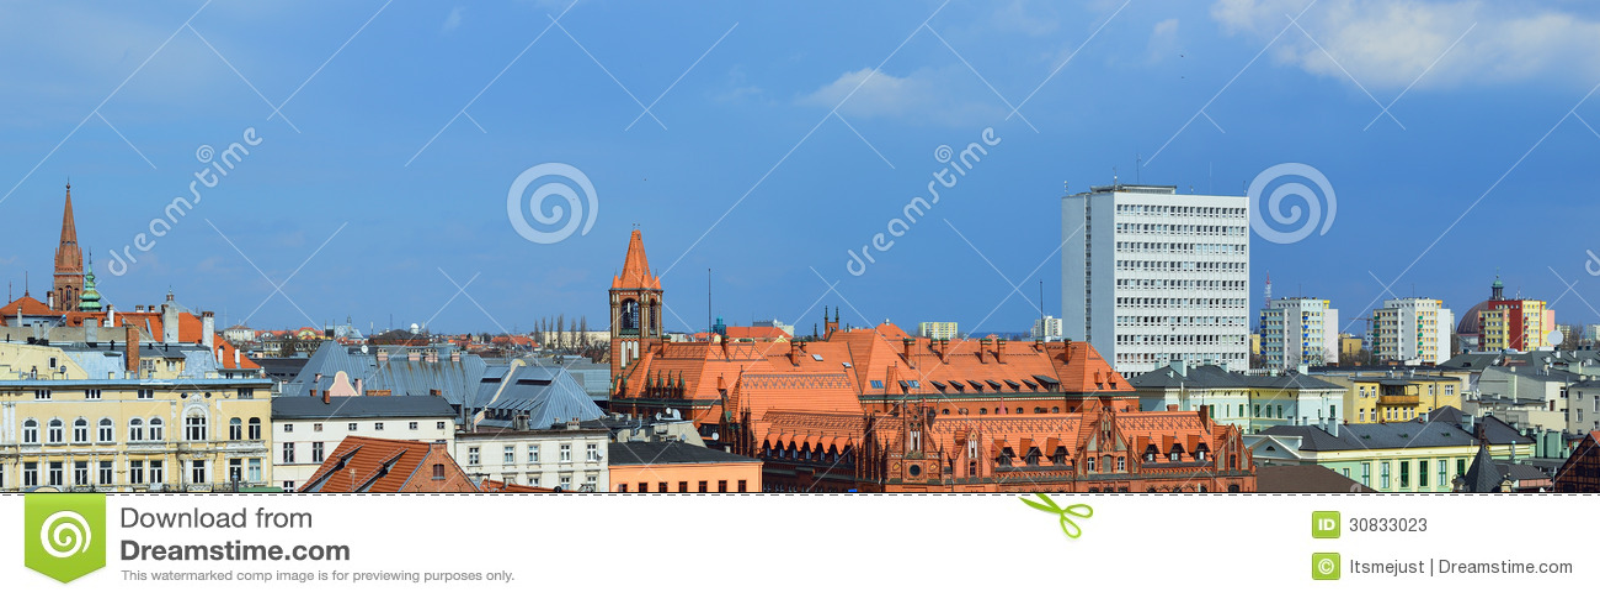 Bydgoszcz, πόλη στην Πολωνία.